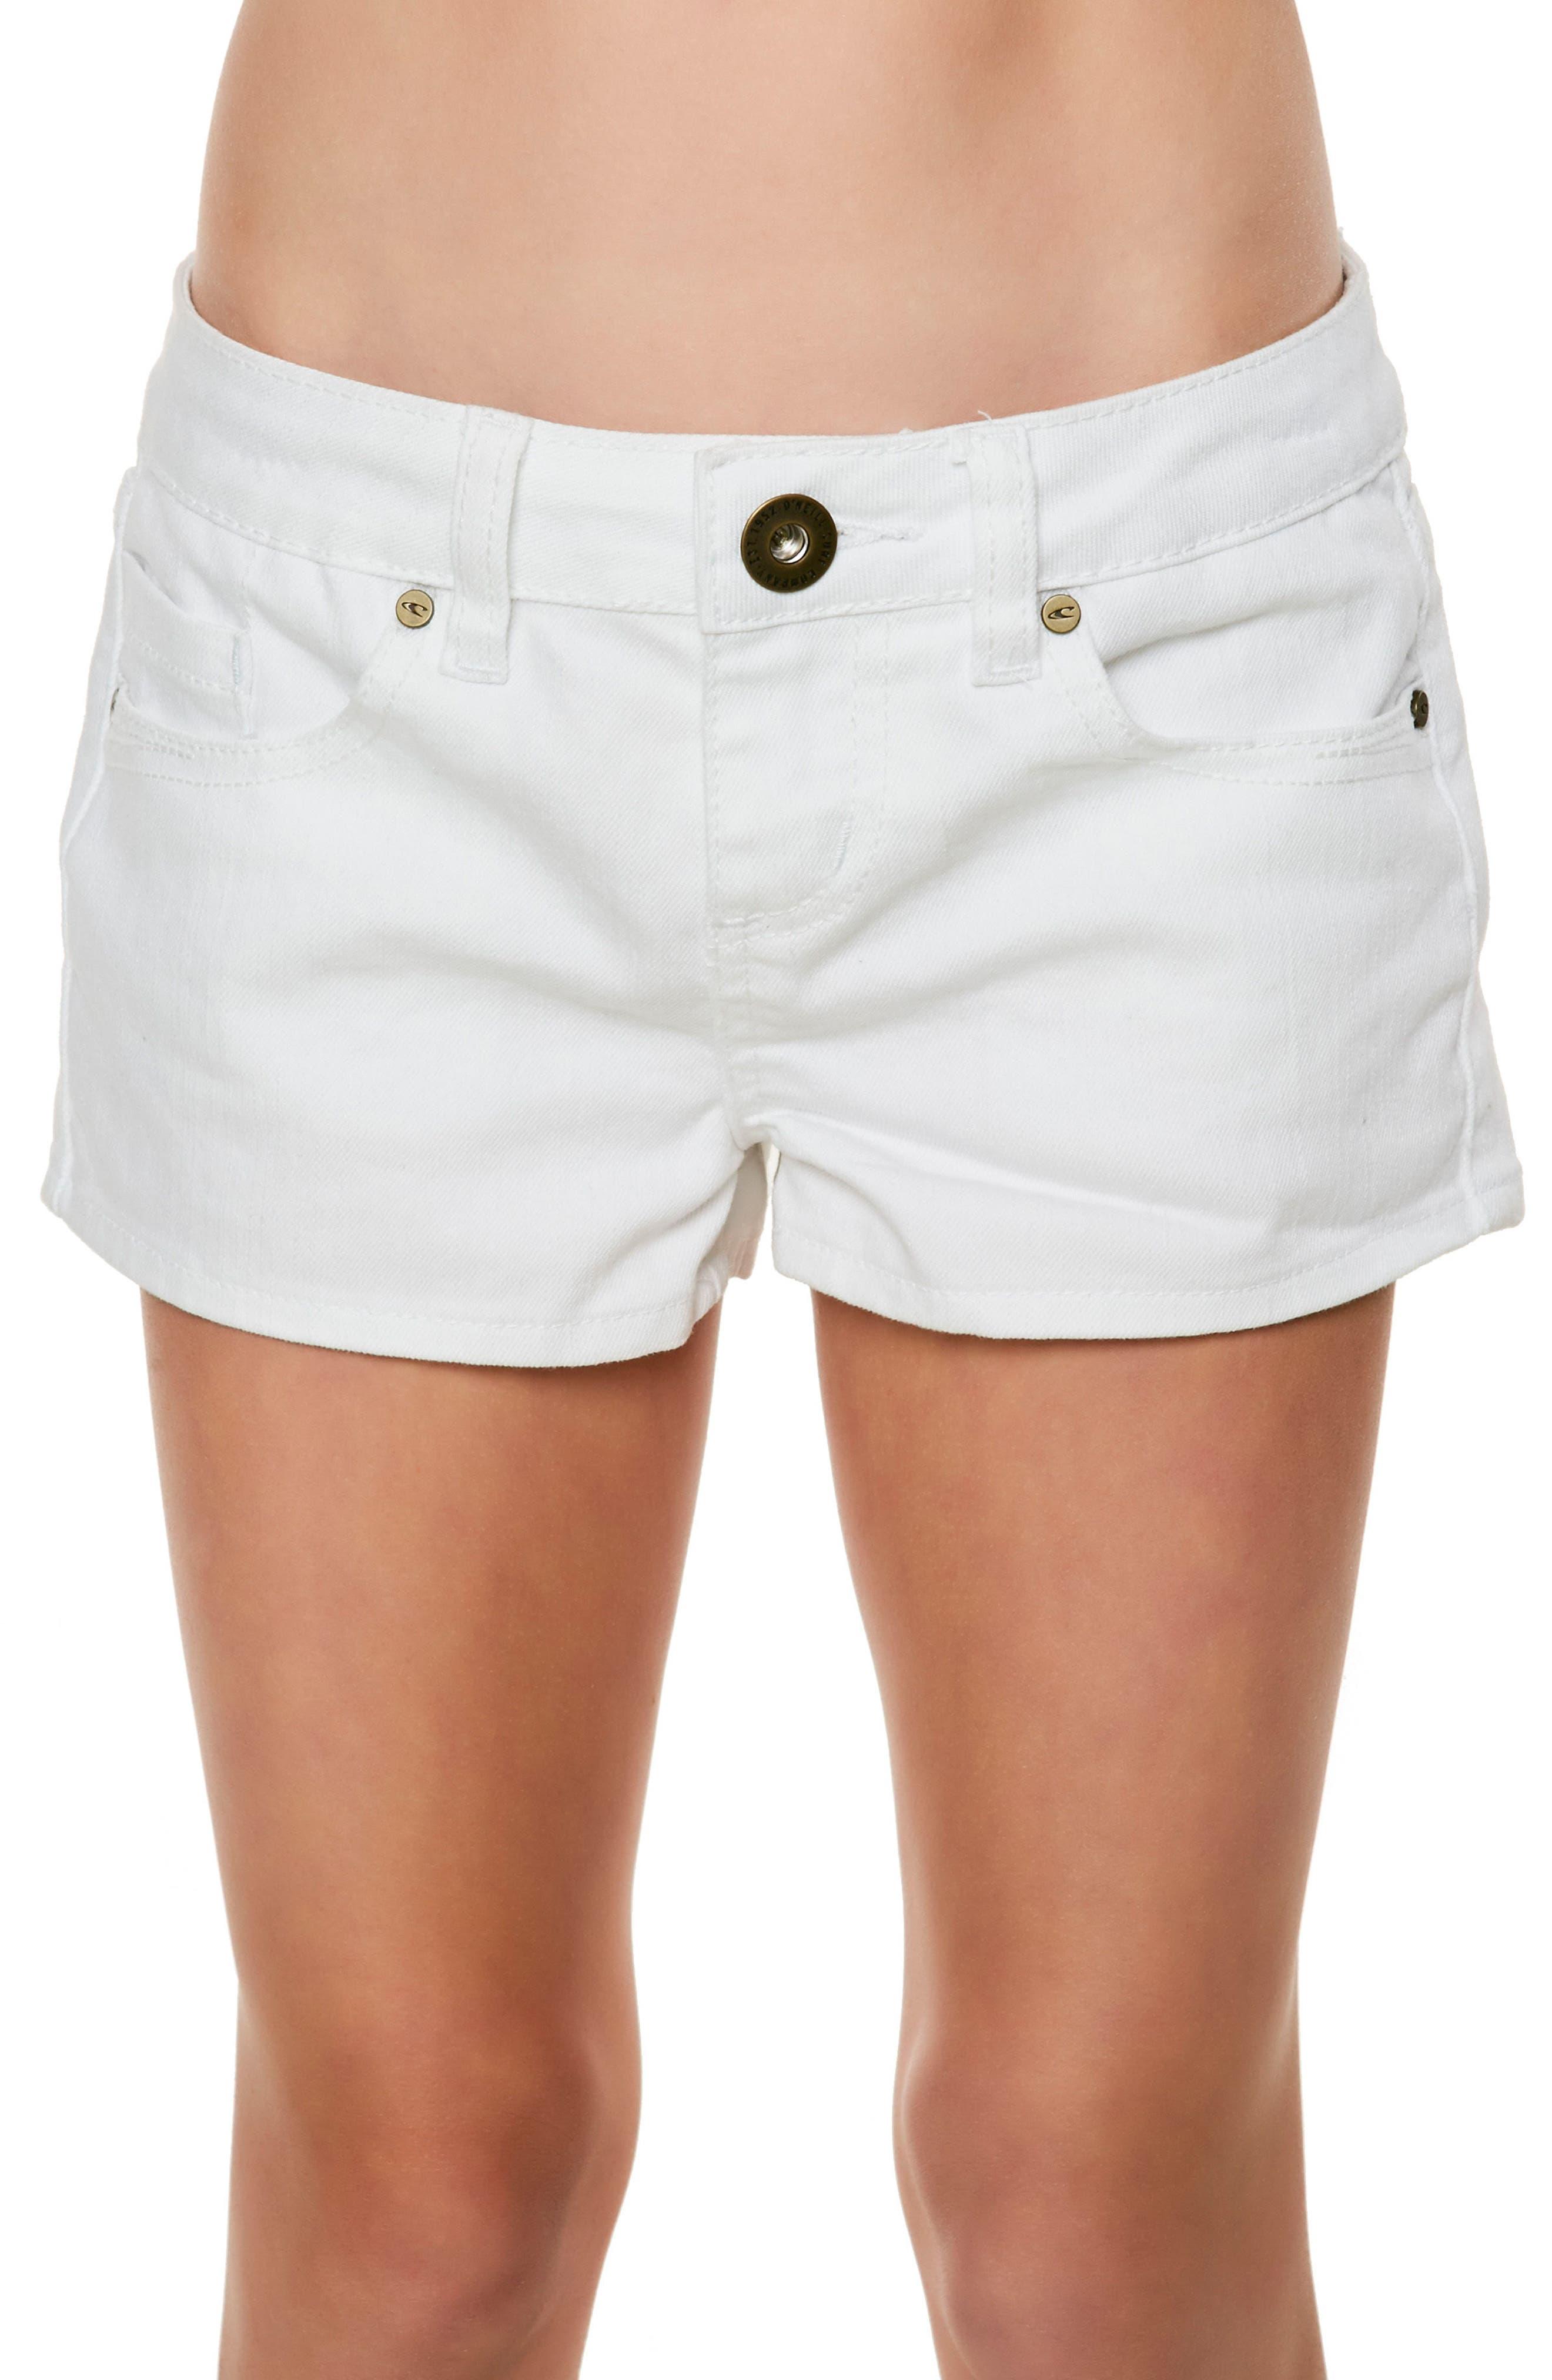 Waidley Denim Shorts,                         Main,                         color,